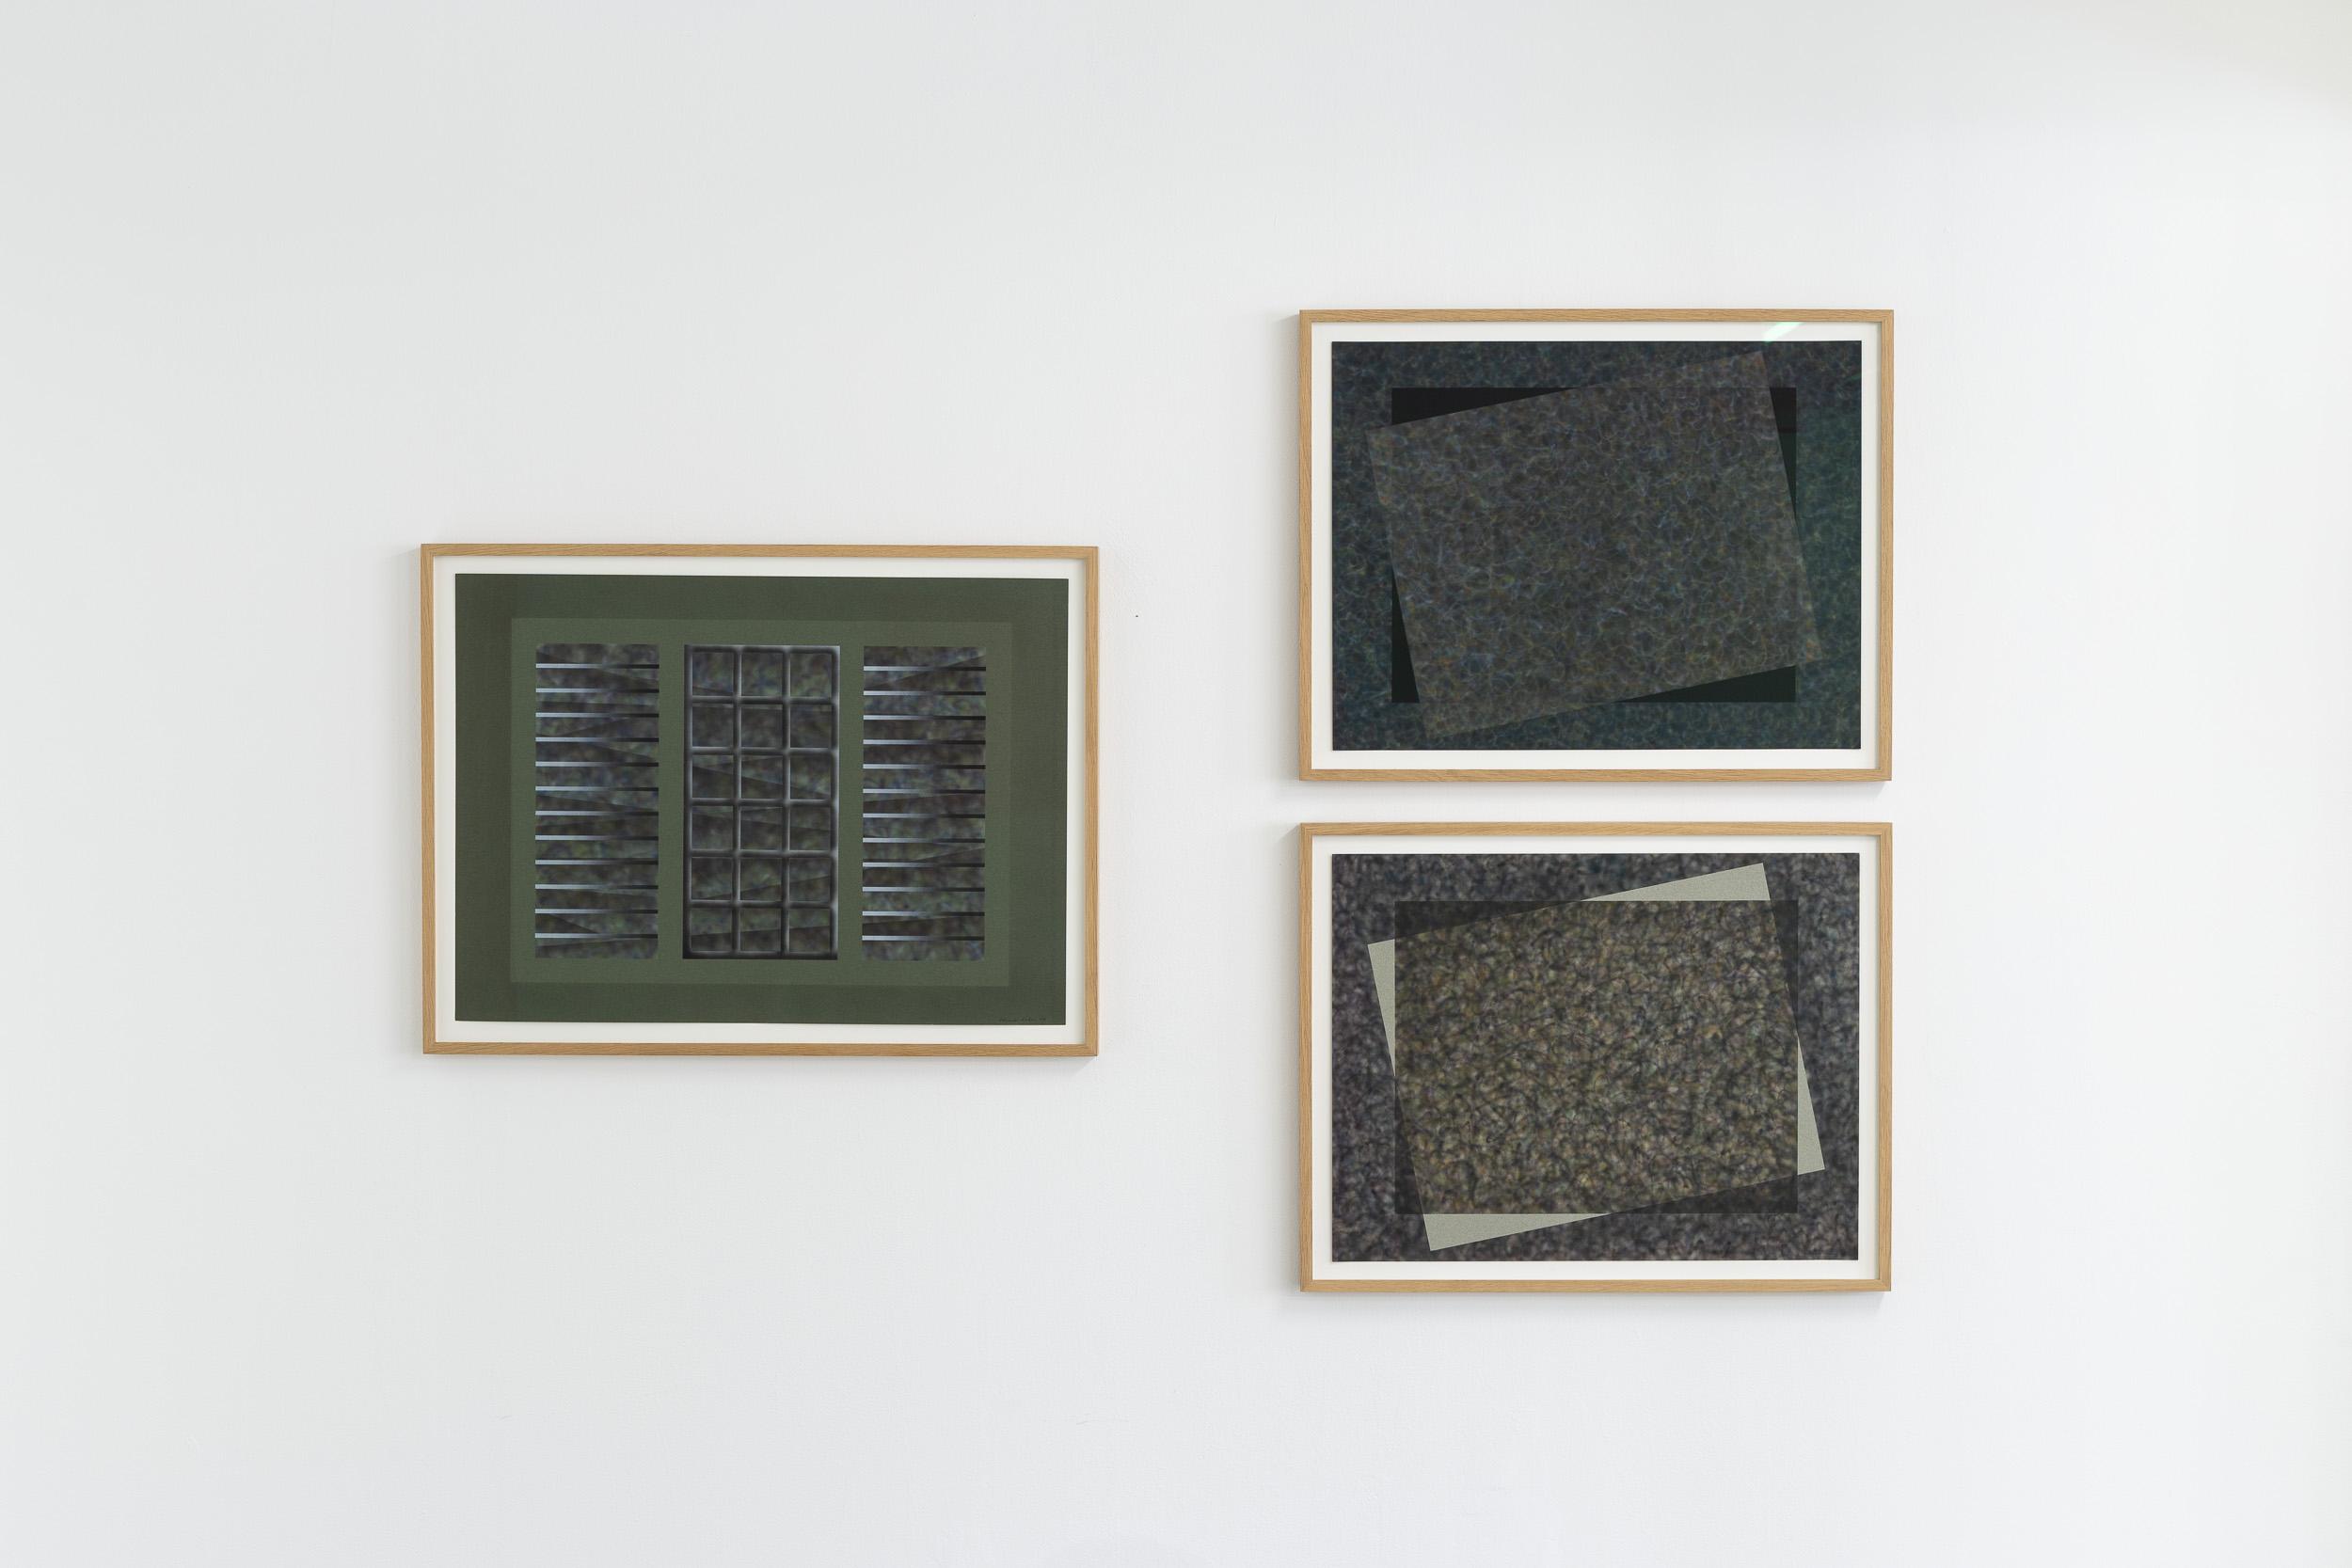 Left: Eduardo Rubén,  Untitled  (from Windows series), 1987, acrylic on paper, 75 x 55 cm  Right: Eduardo Rubén,  Untitled  (from Windows series), 1985, acrylic on paper, 75 x 55 cm  Photo: Kilian Bannwart